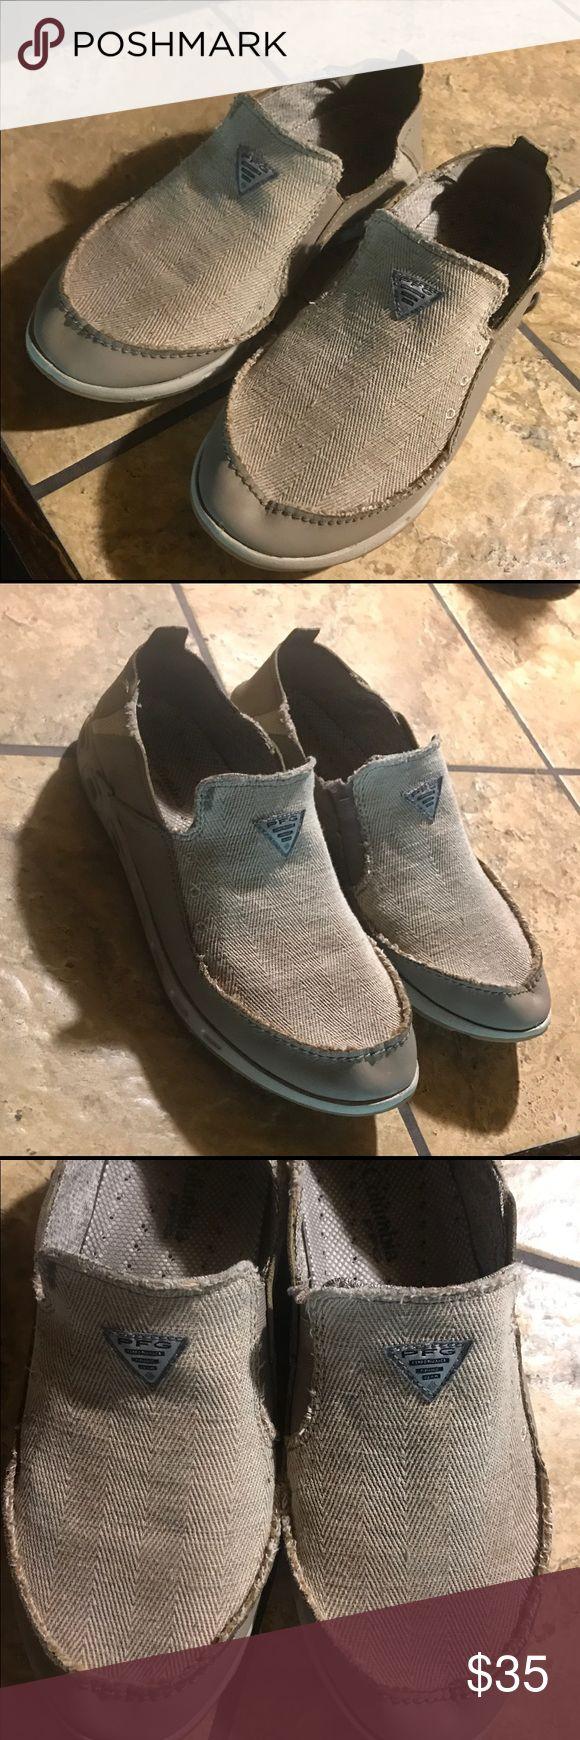 Columbia Sportswear Bahama Vent PFG Slip-ons Columbia sportswear Bahama vent PFG slip on shoes. Worn a handful of times. Khaki color. Worn a handful of times. Size 11.5 Columbia Shoes Loafers & Slip-Ons